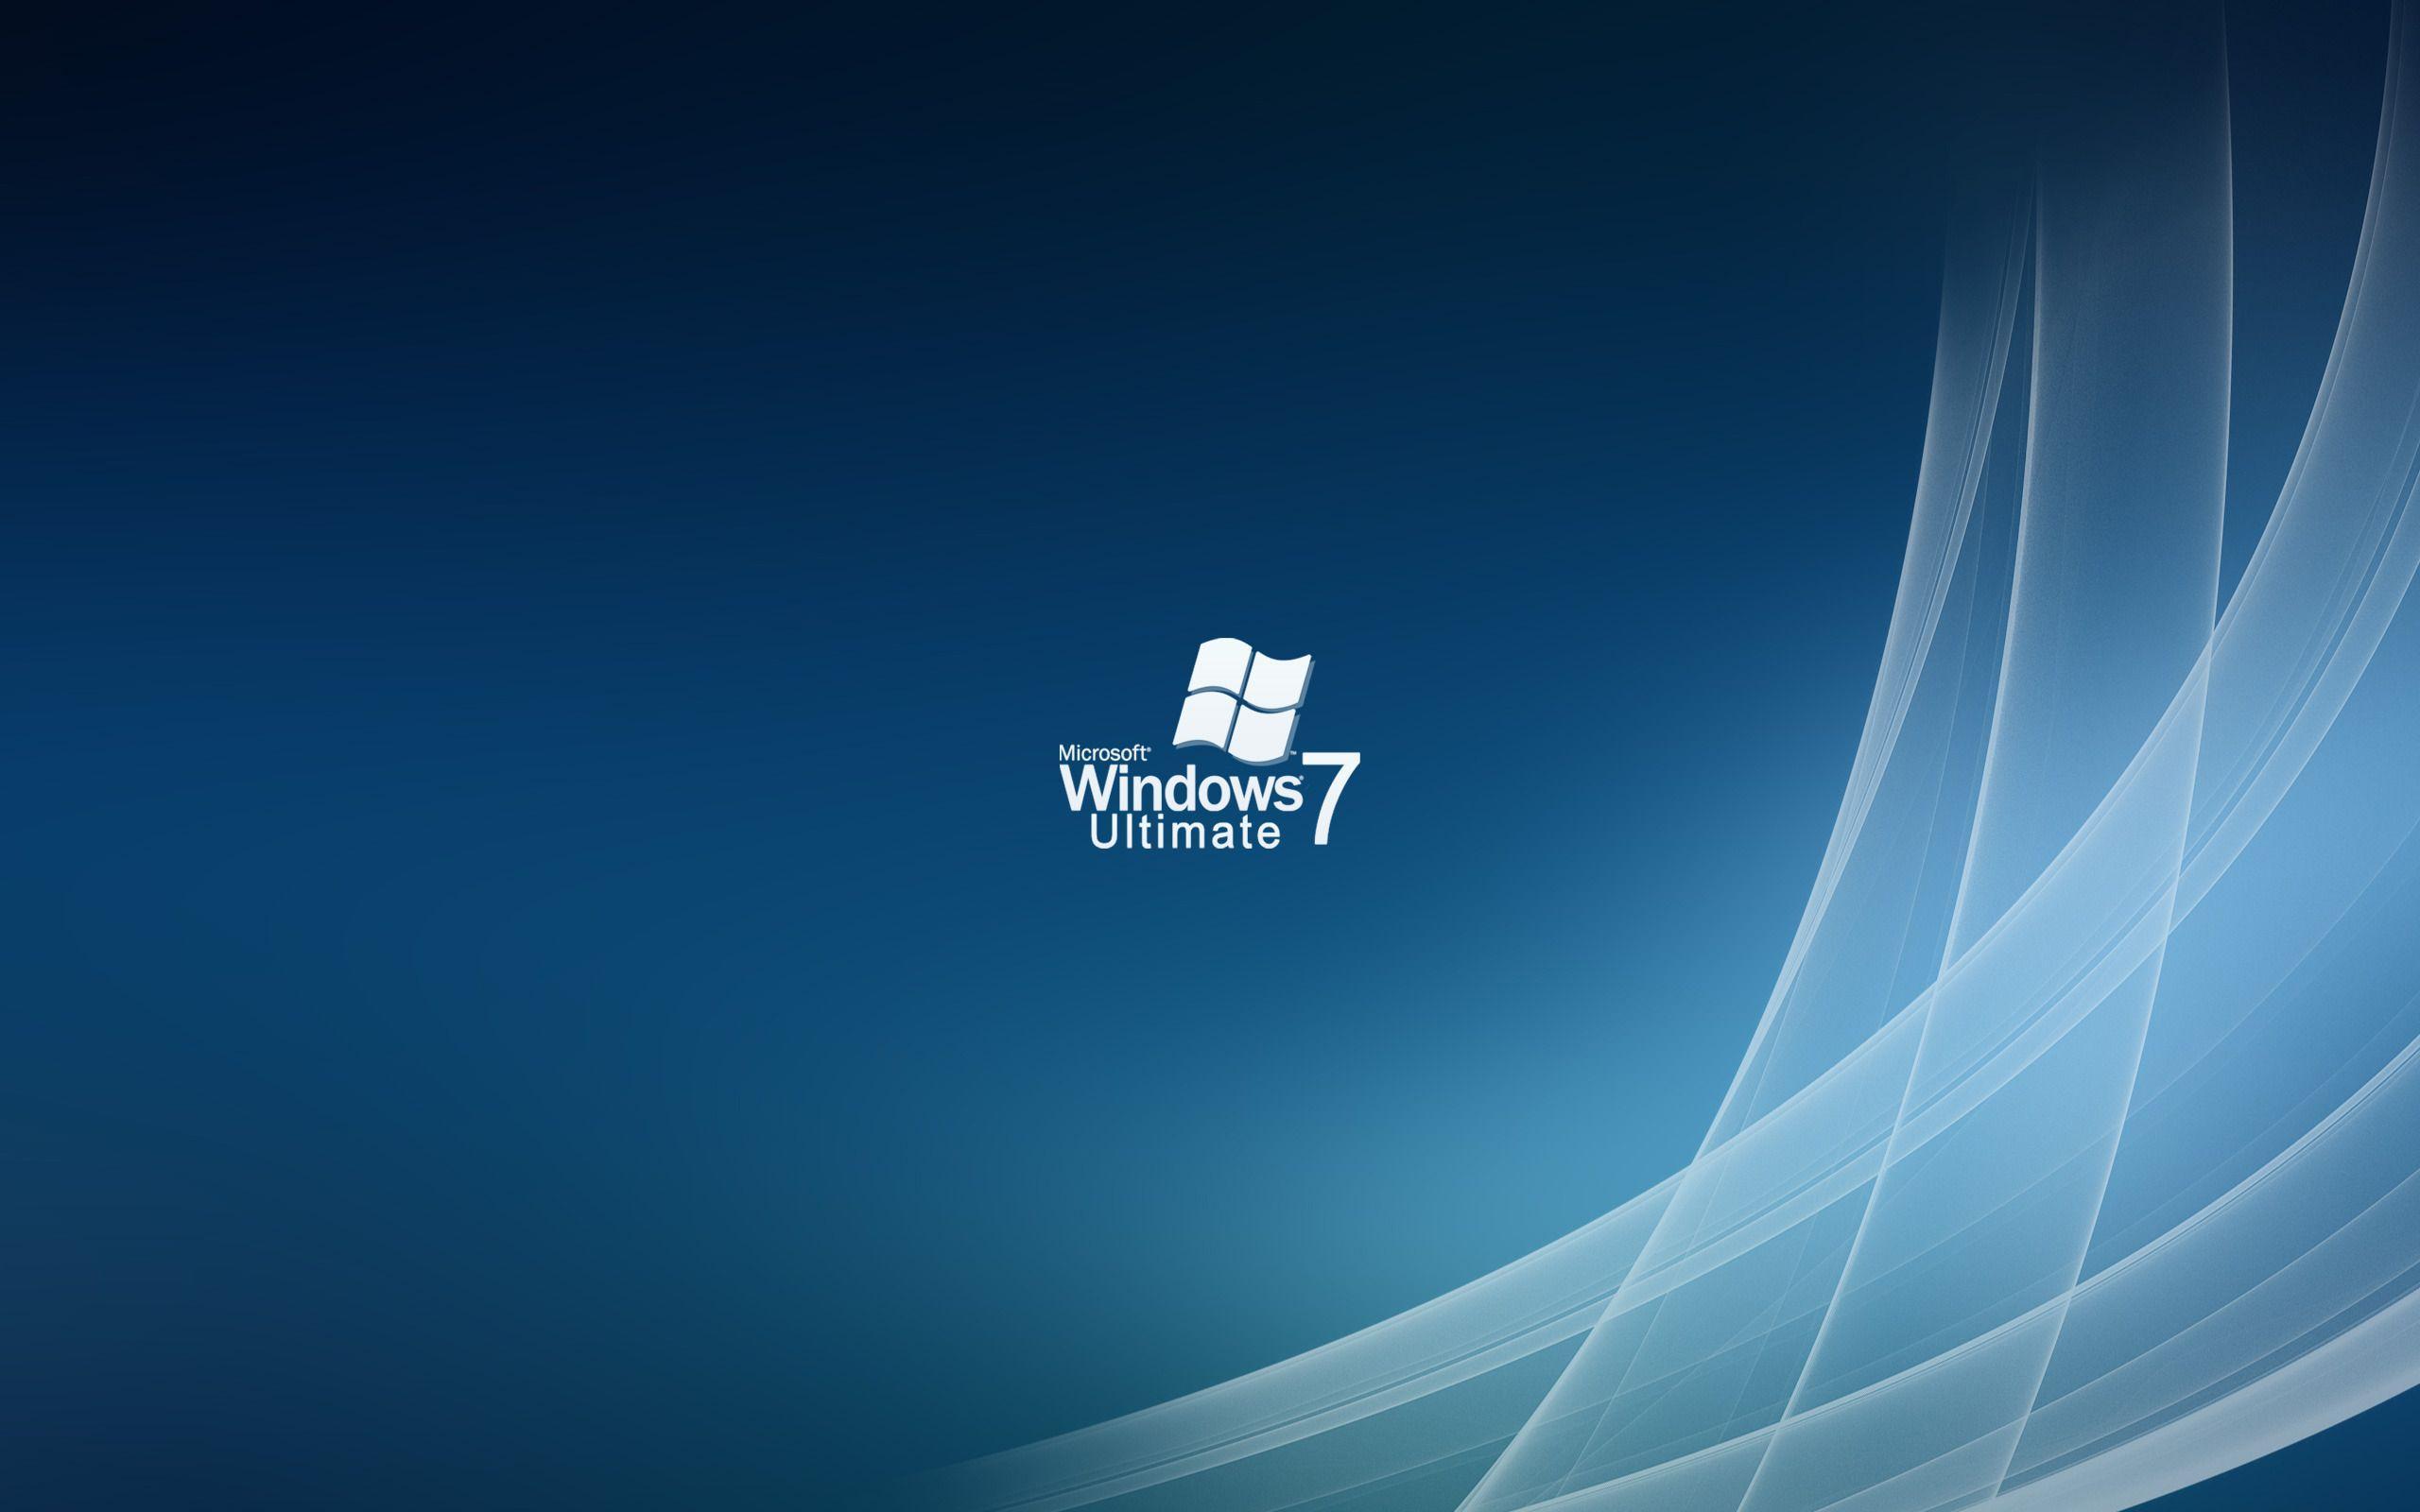 Wallpapers Windows 7 Hd Wallpaper Cave